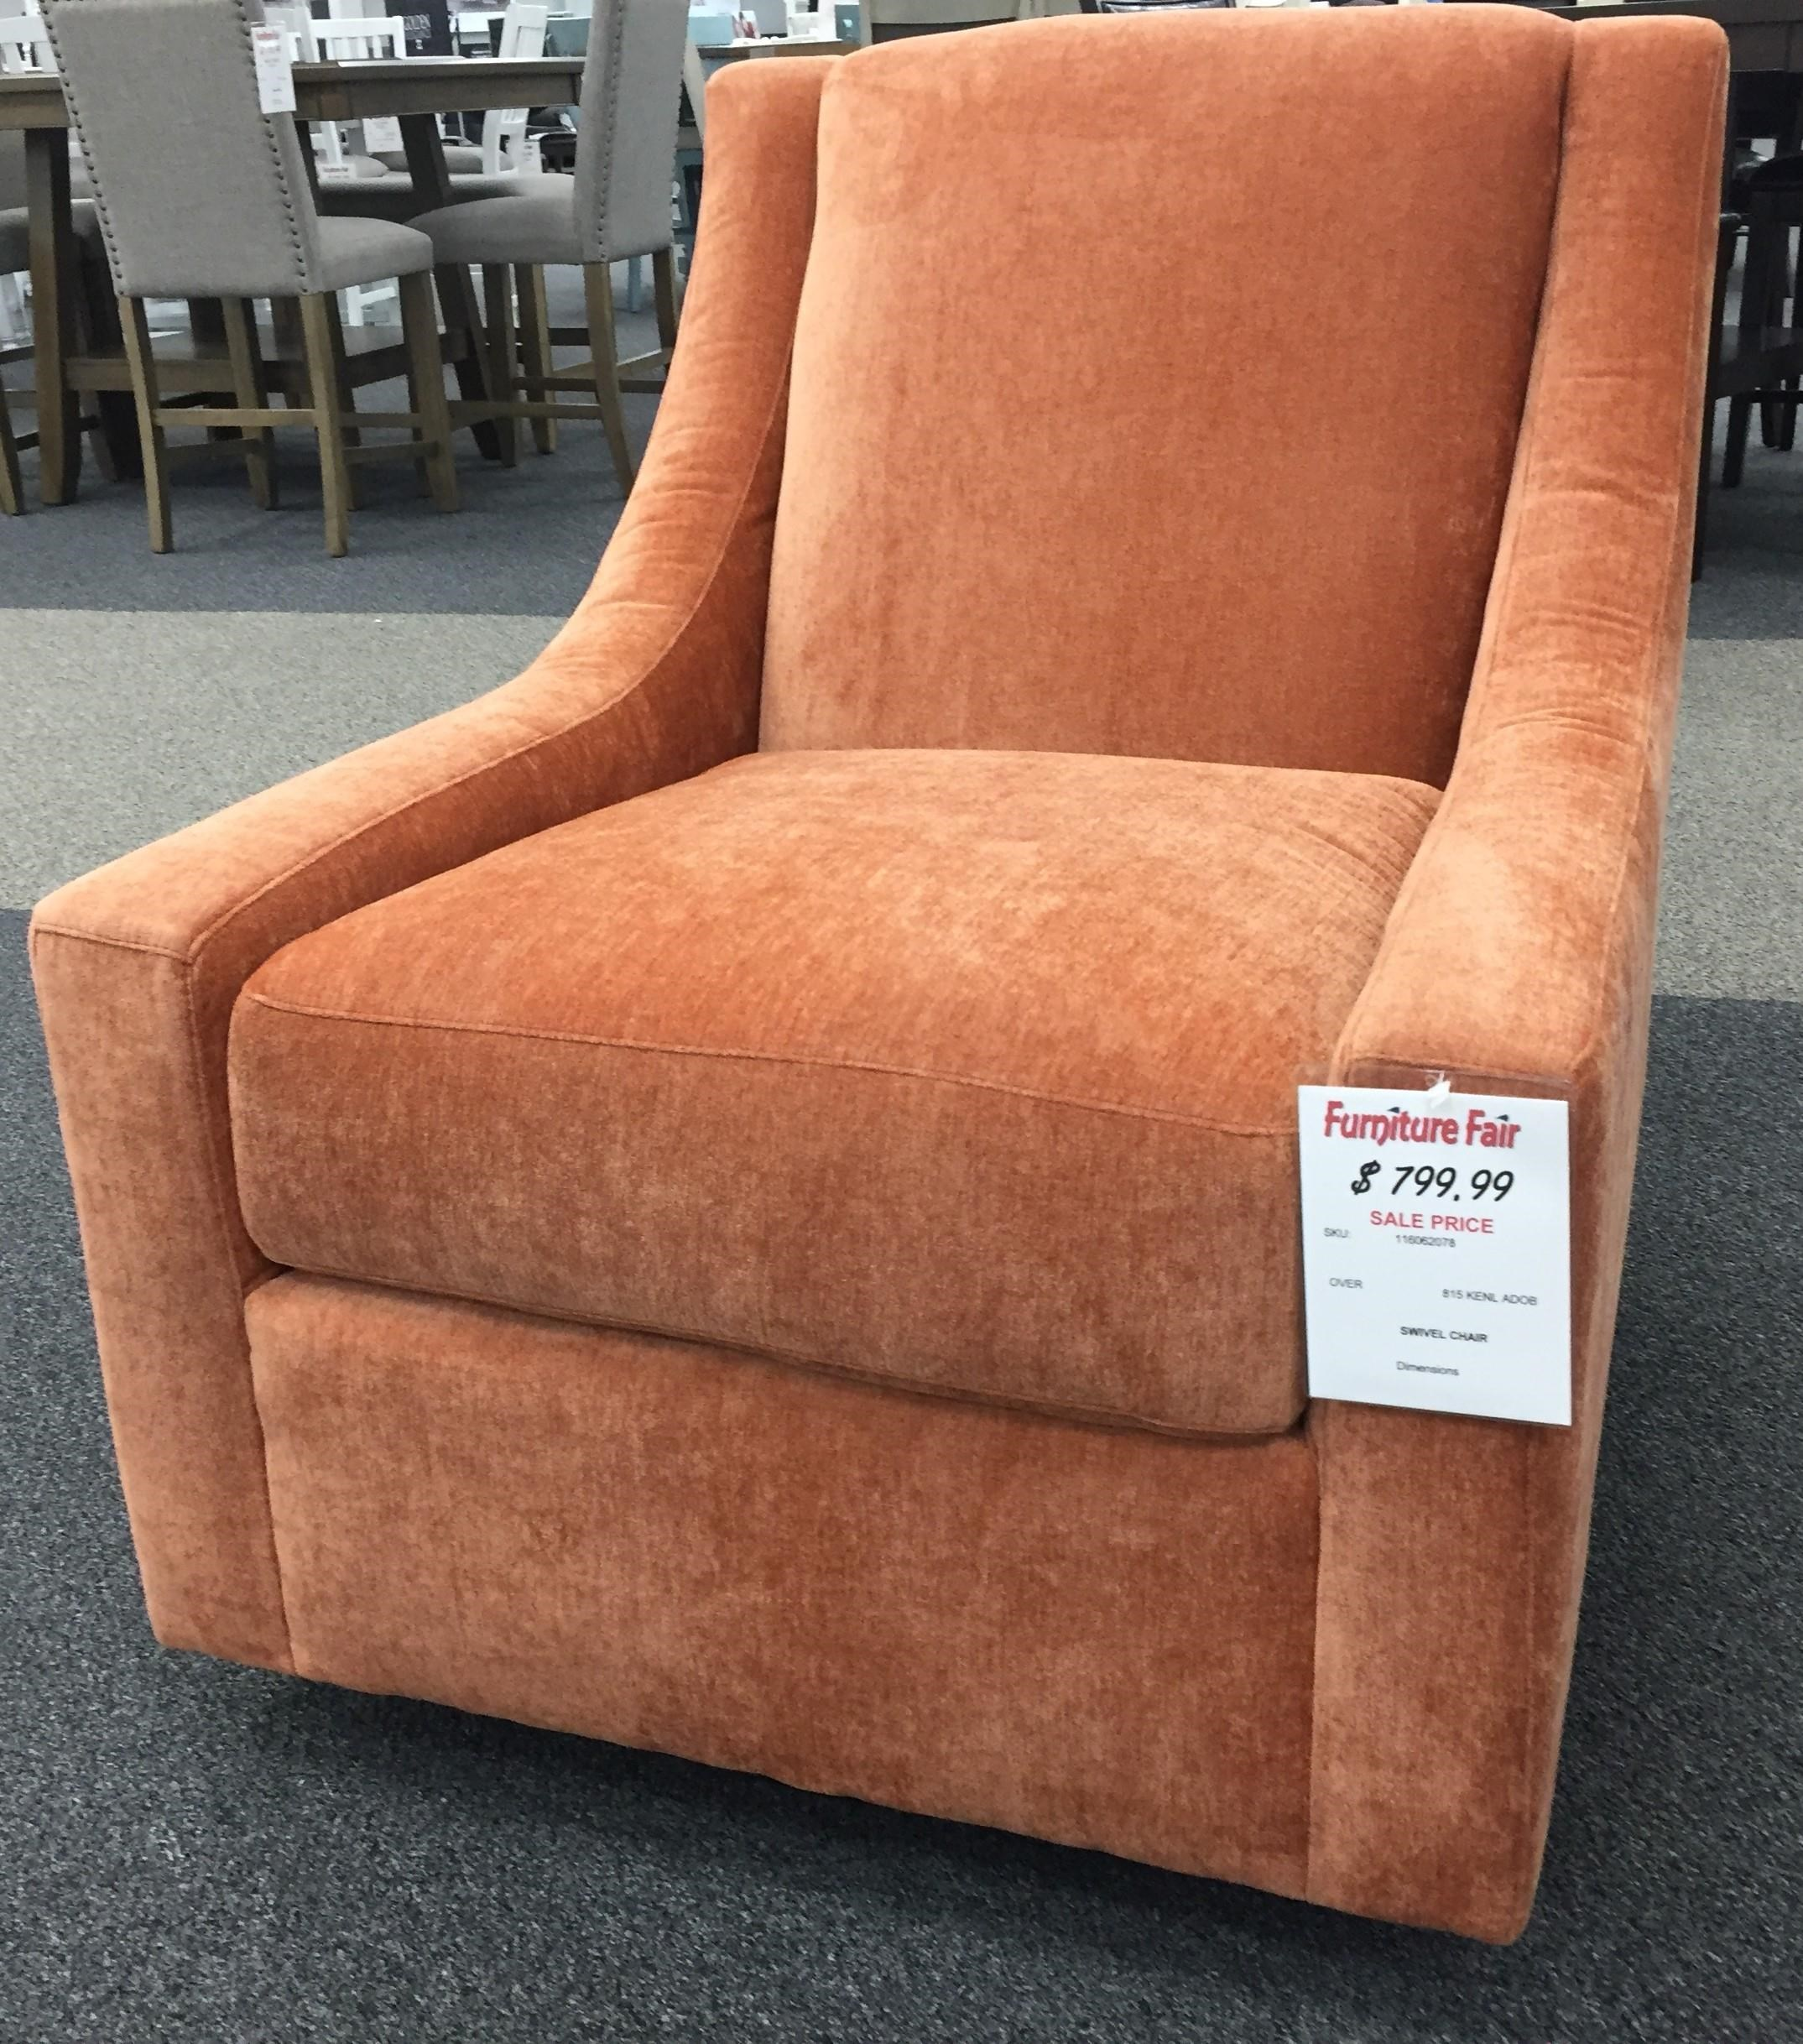 Coastal Sleeper Collection Swivel Rocker Chair - Adobe Rust by Overnight Sofa at Furniture Fair - North Carolina